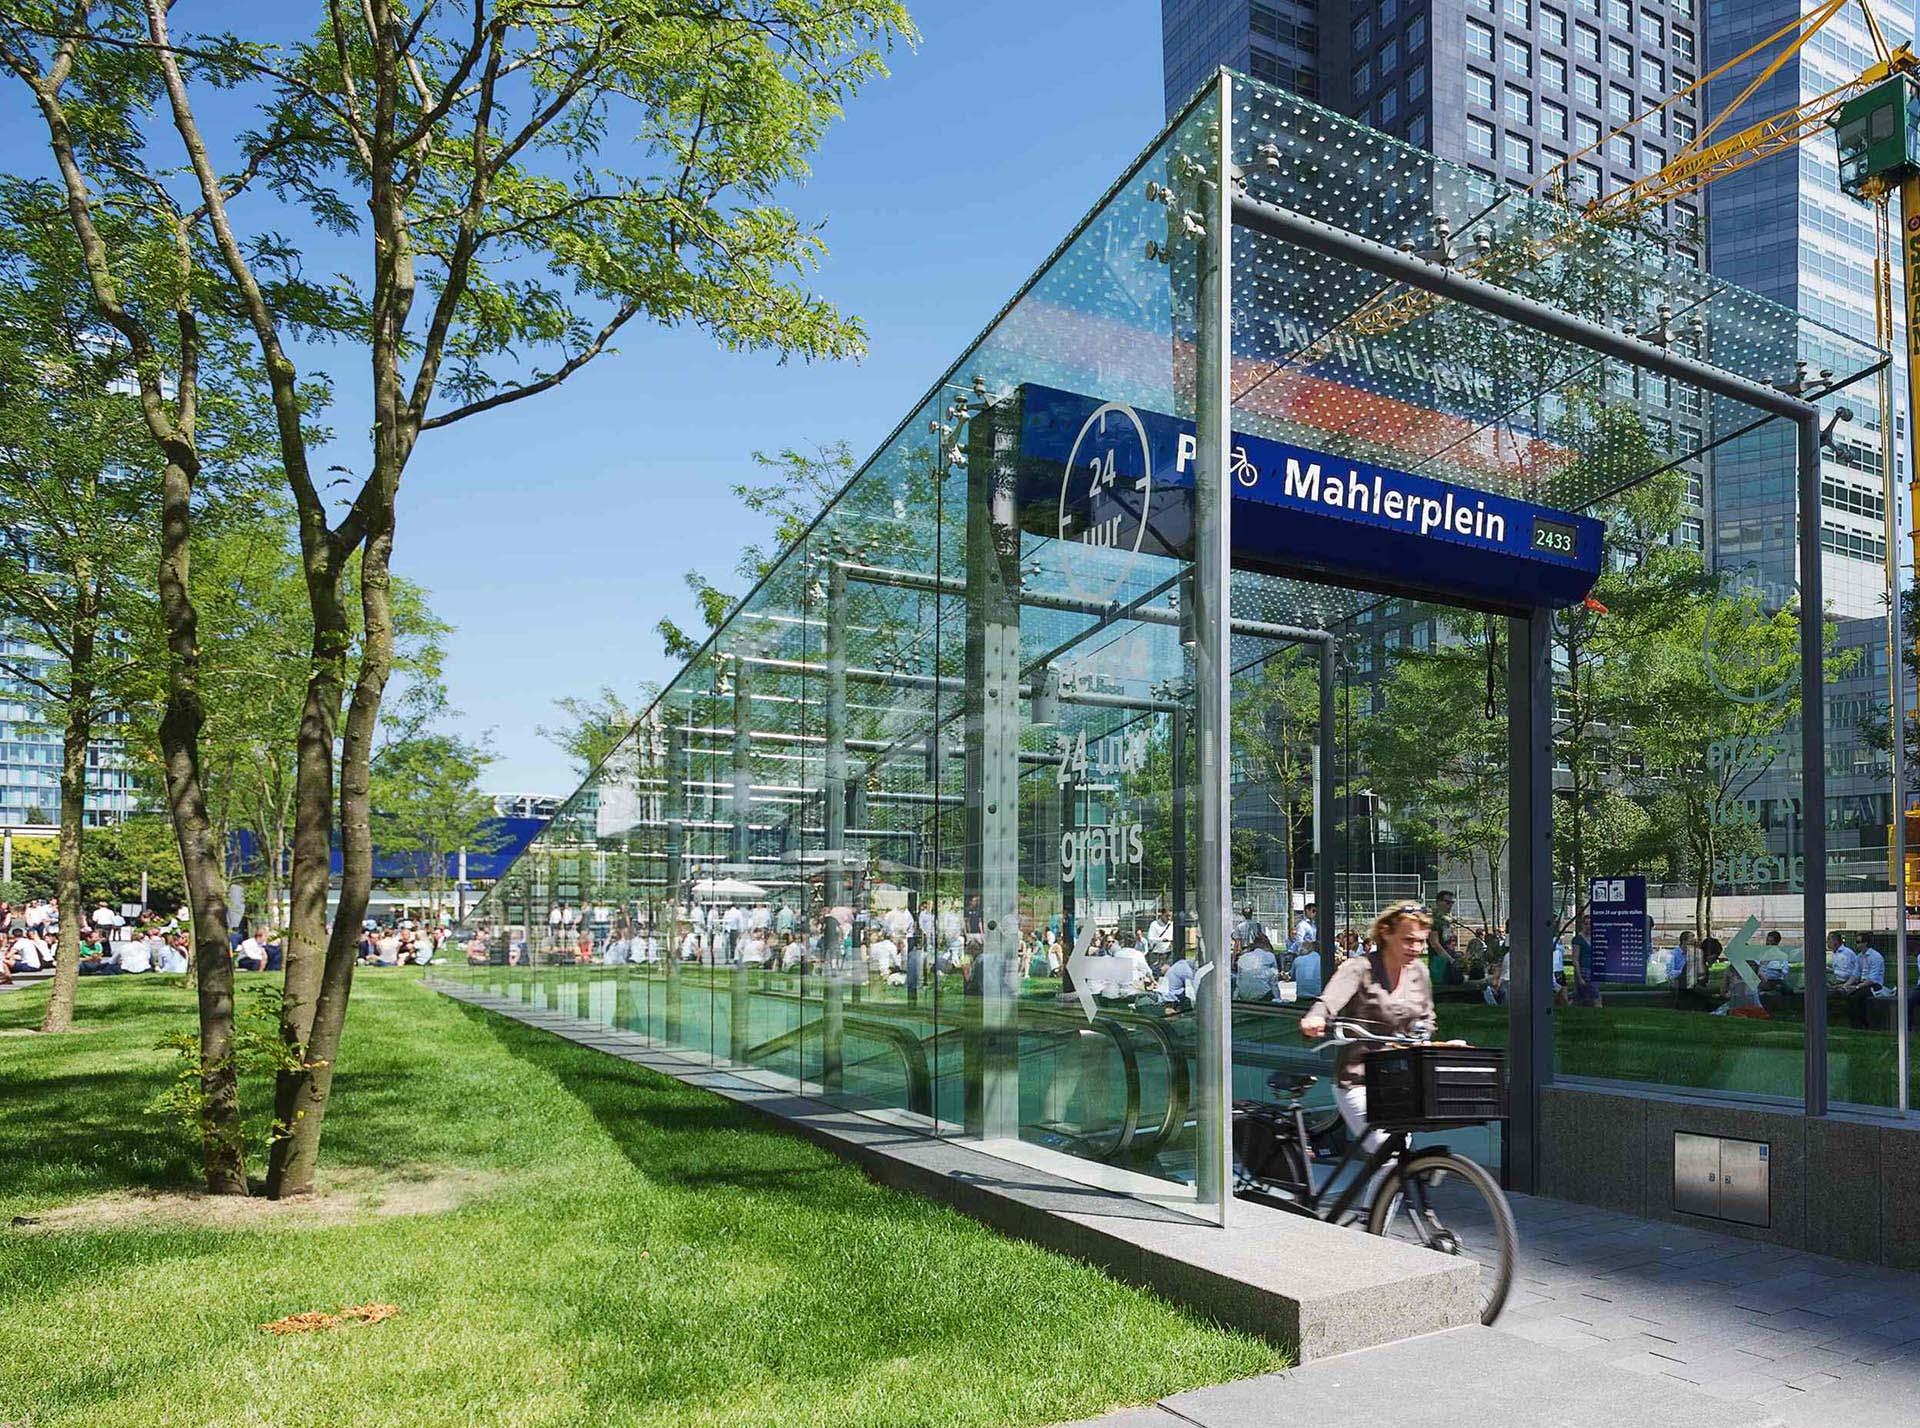 Ondergrondse fietsenstalling Amsterdam Mahlerplein - i.s.m. BAM